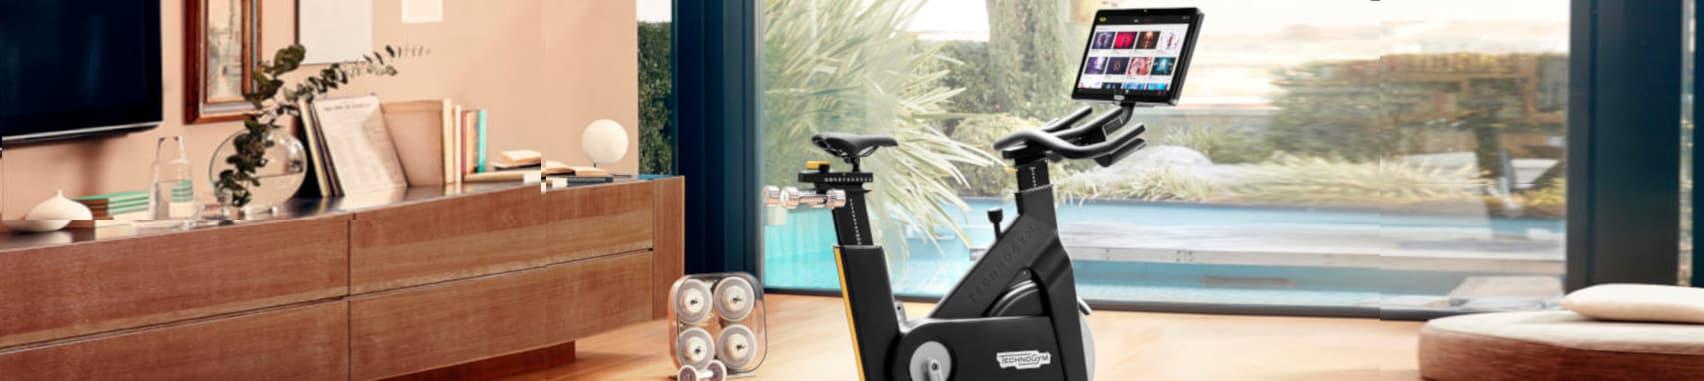 technogym-bike-Nightingale-client